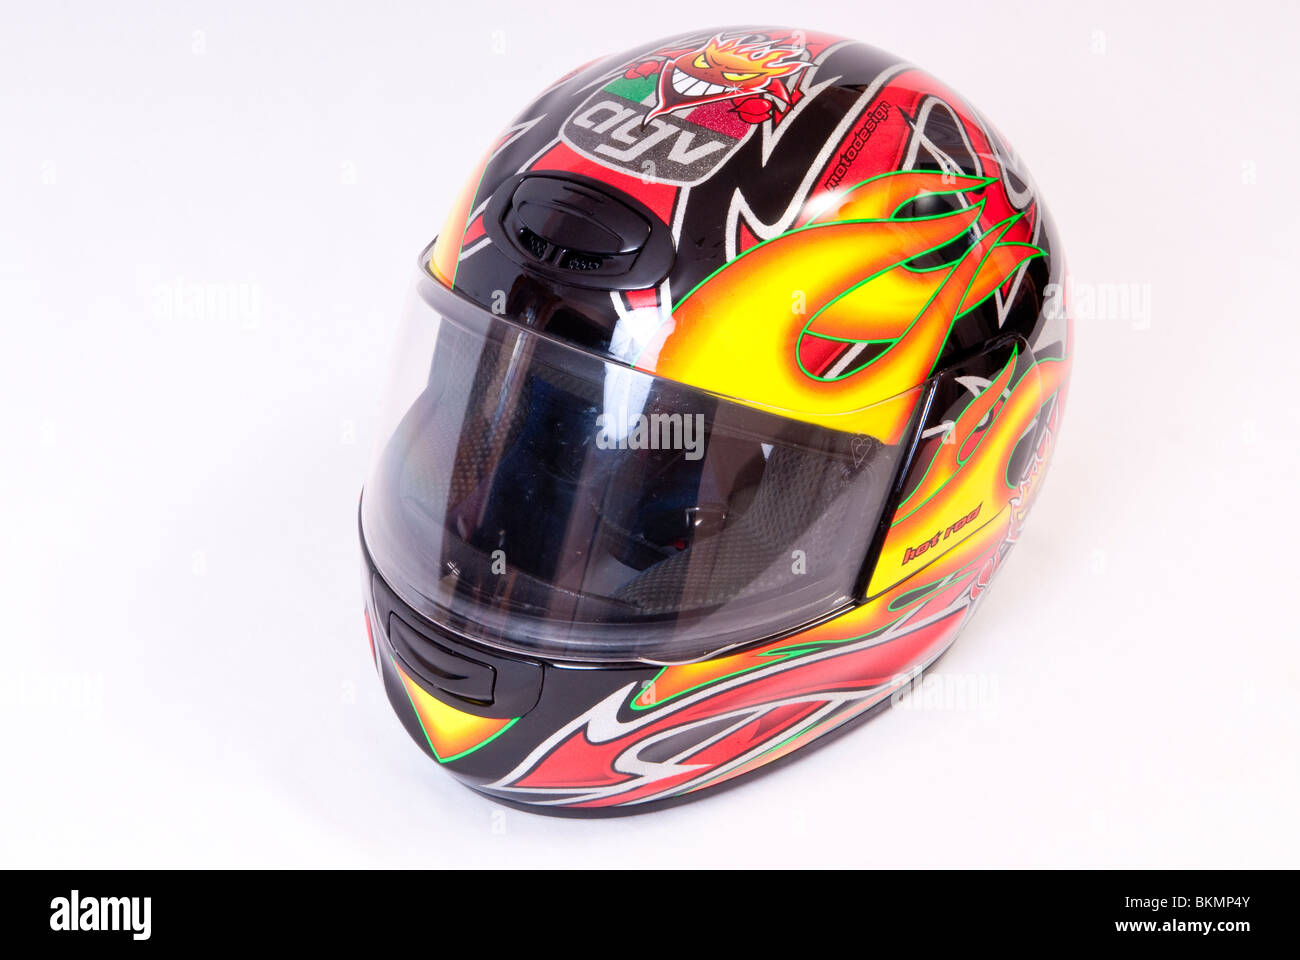 Motorcycle Crash Helmet Stock Photo